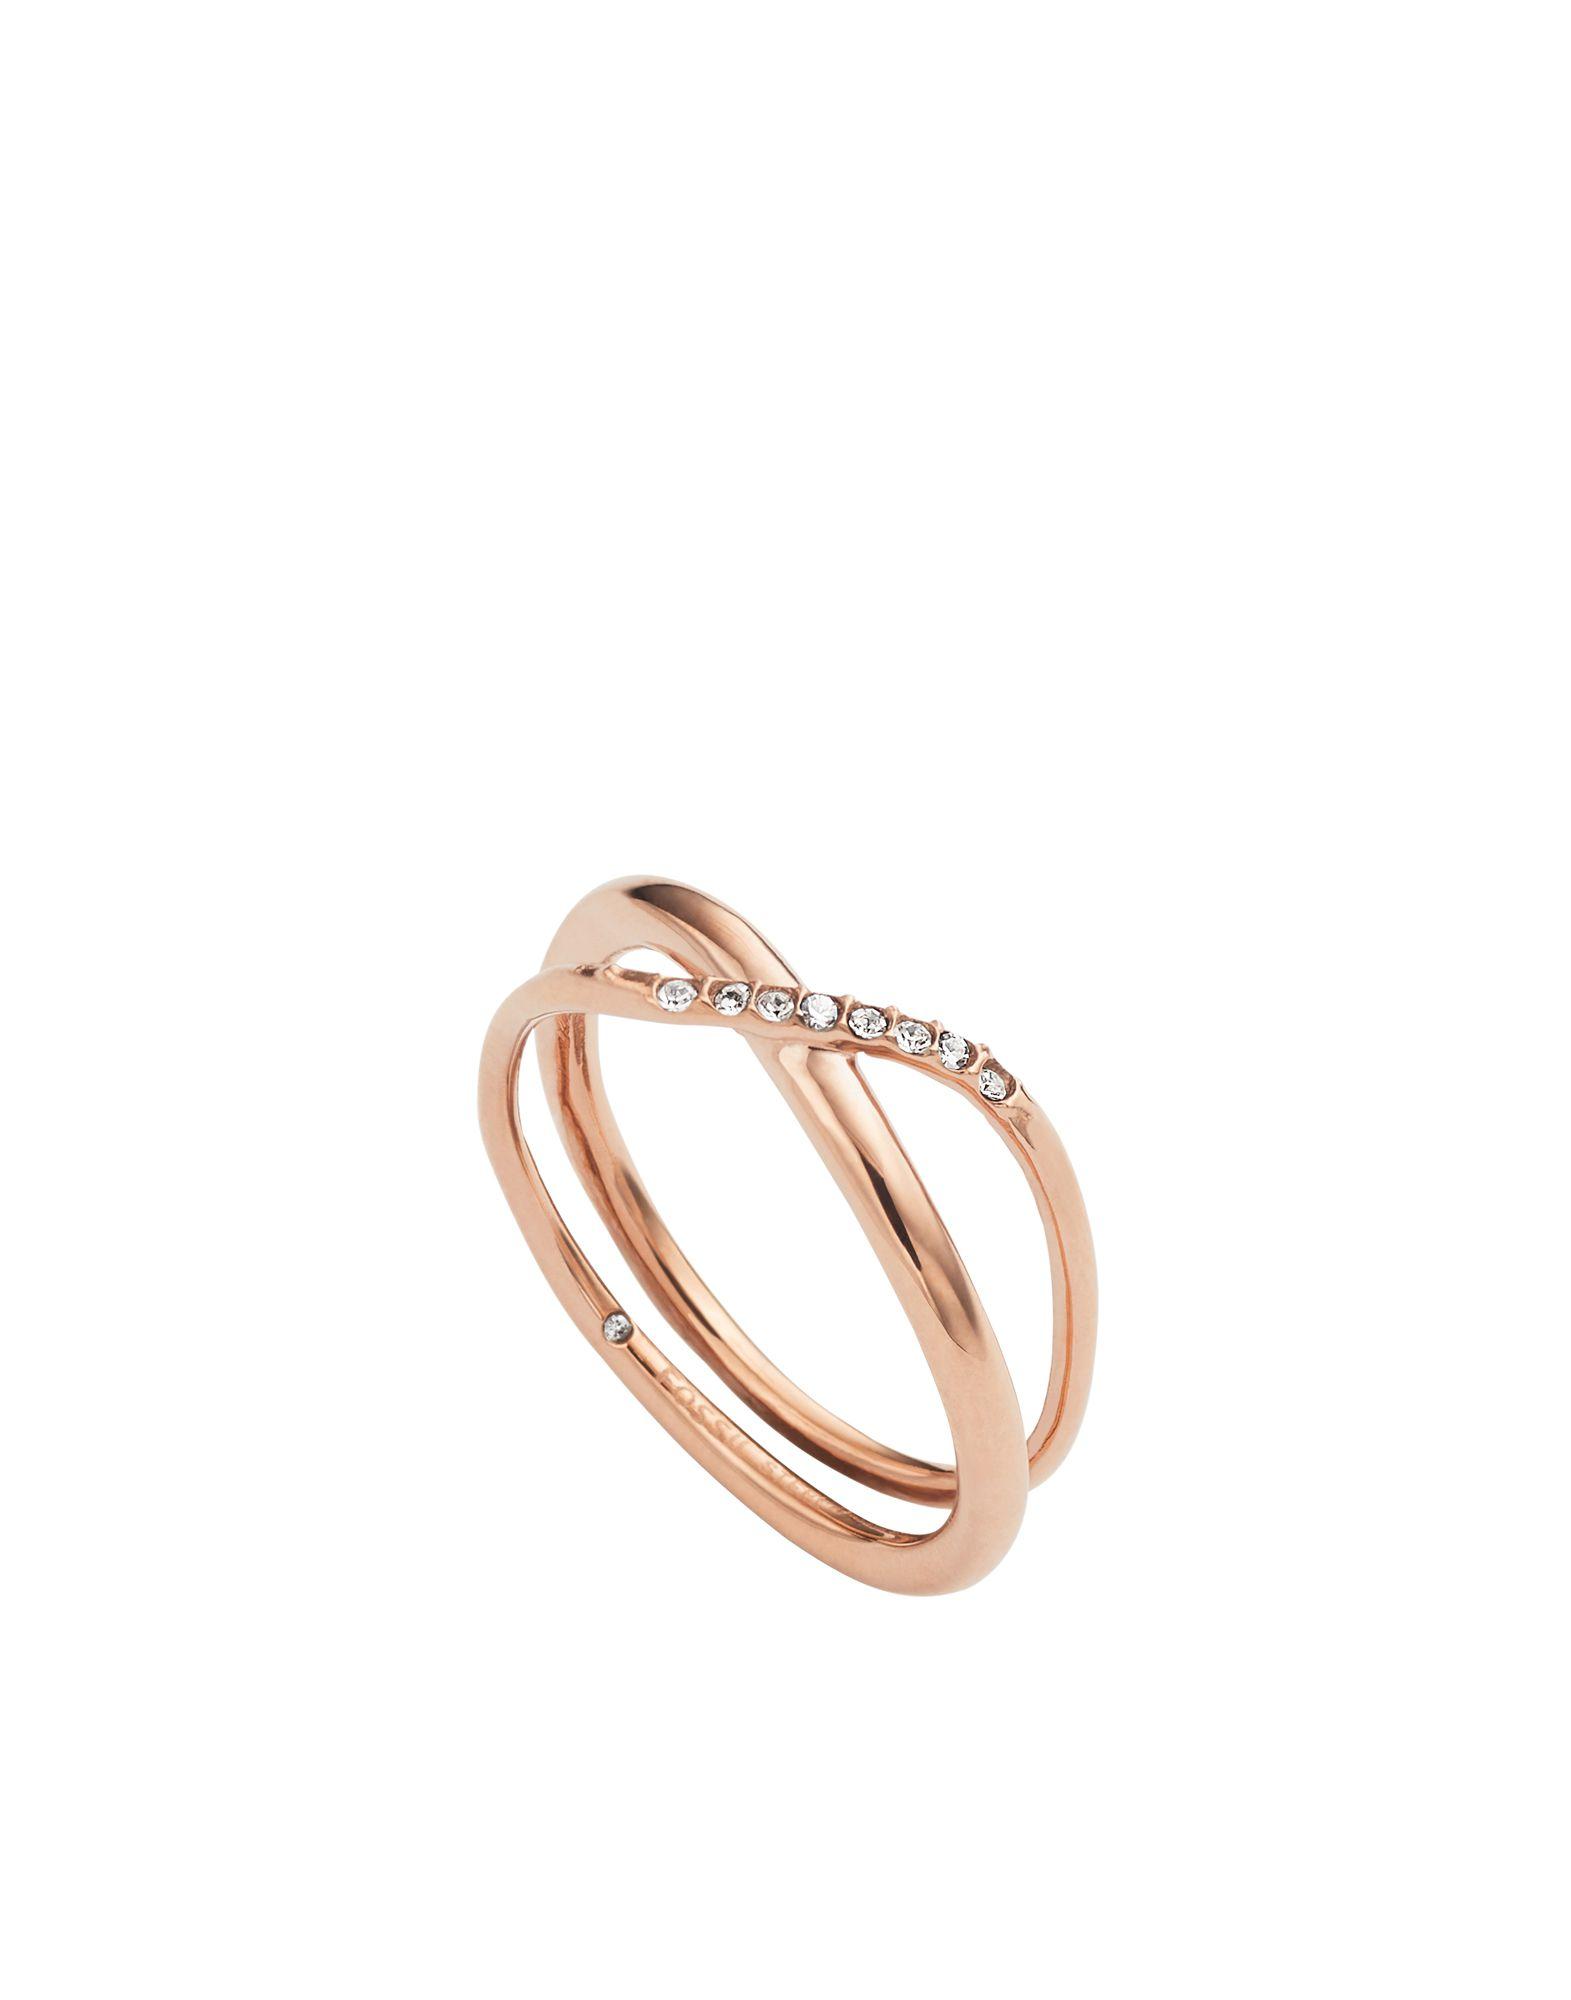 FOSSIL Damen Ring Farbe Kupfer Größe 17